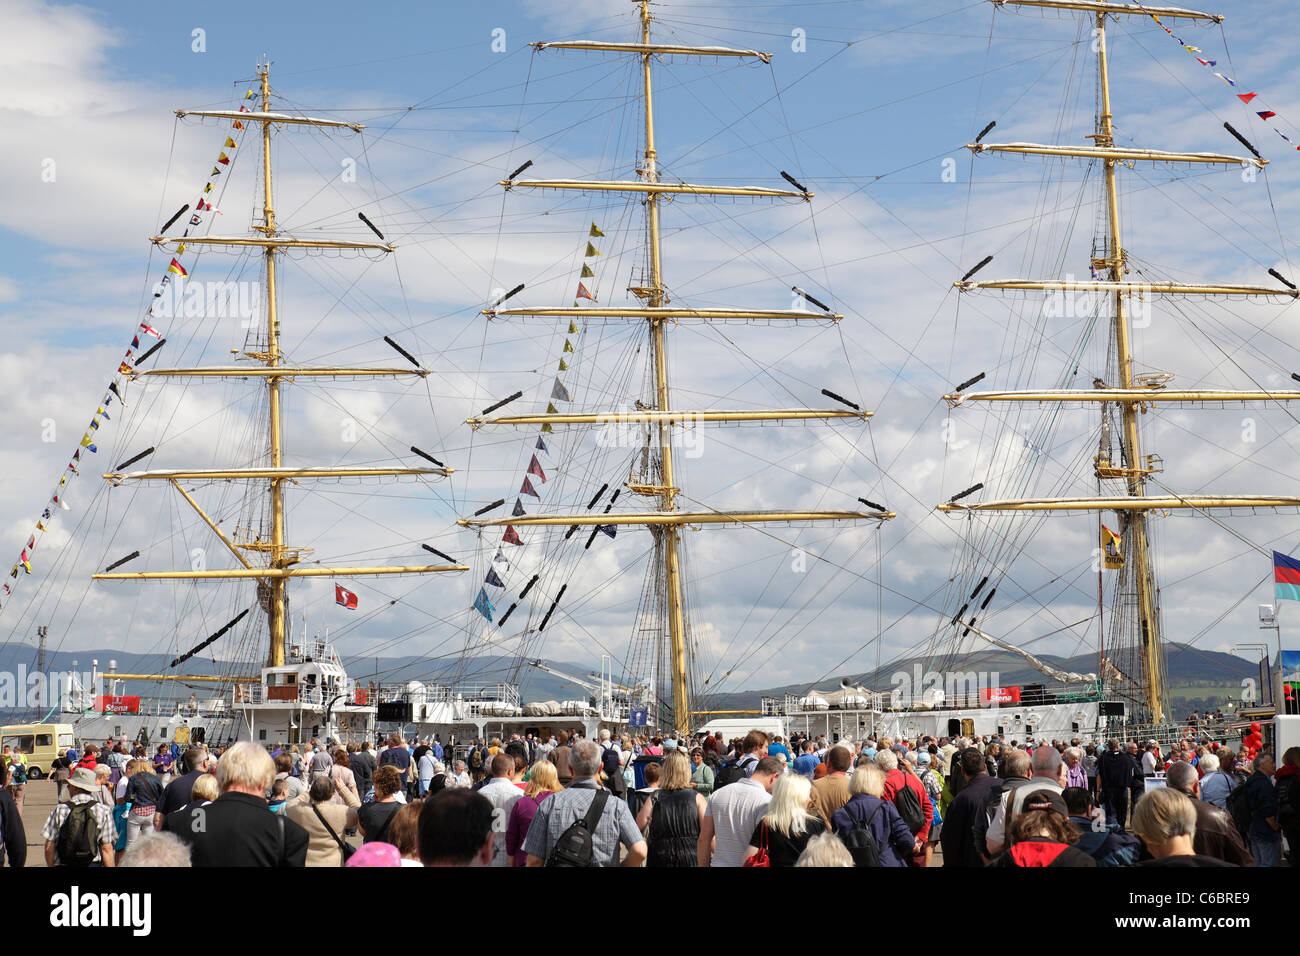 Spectators at the Tall Ships Race 2011 in Greenock, Scotland, UK - Stock Image